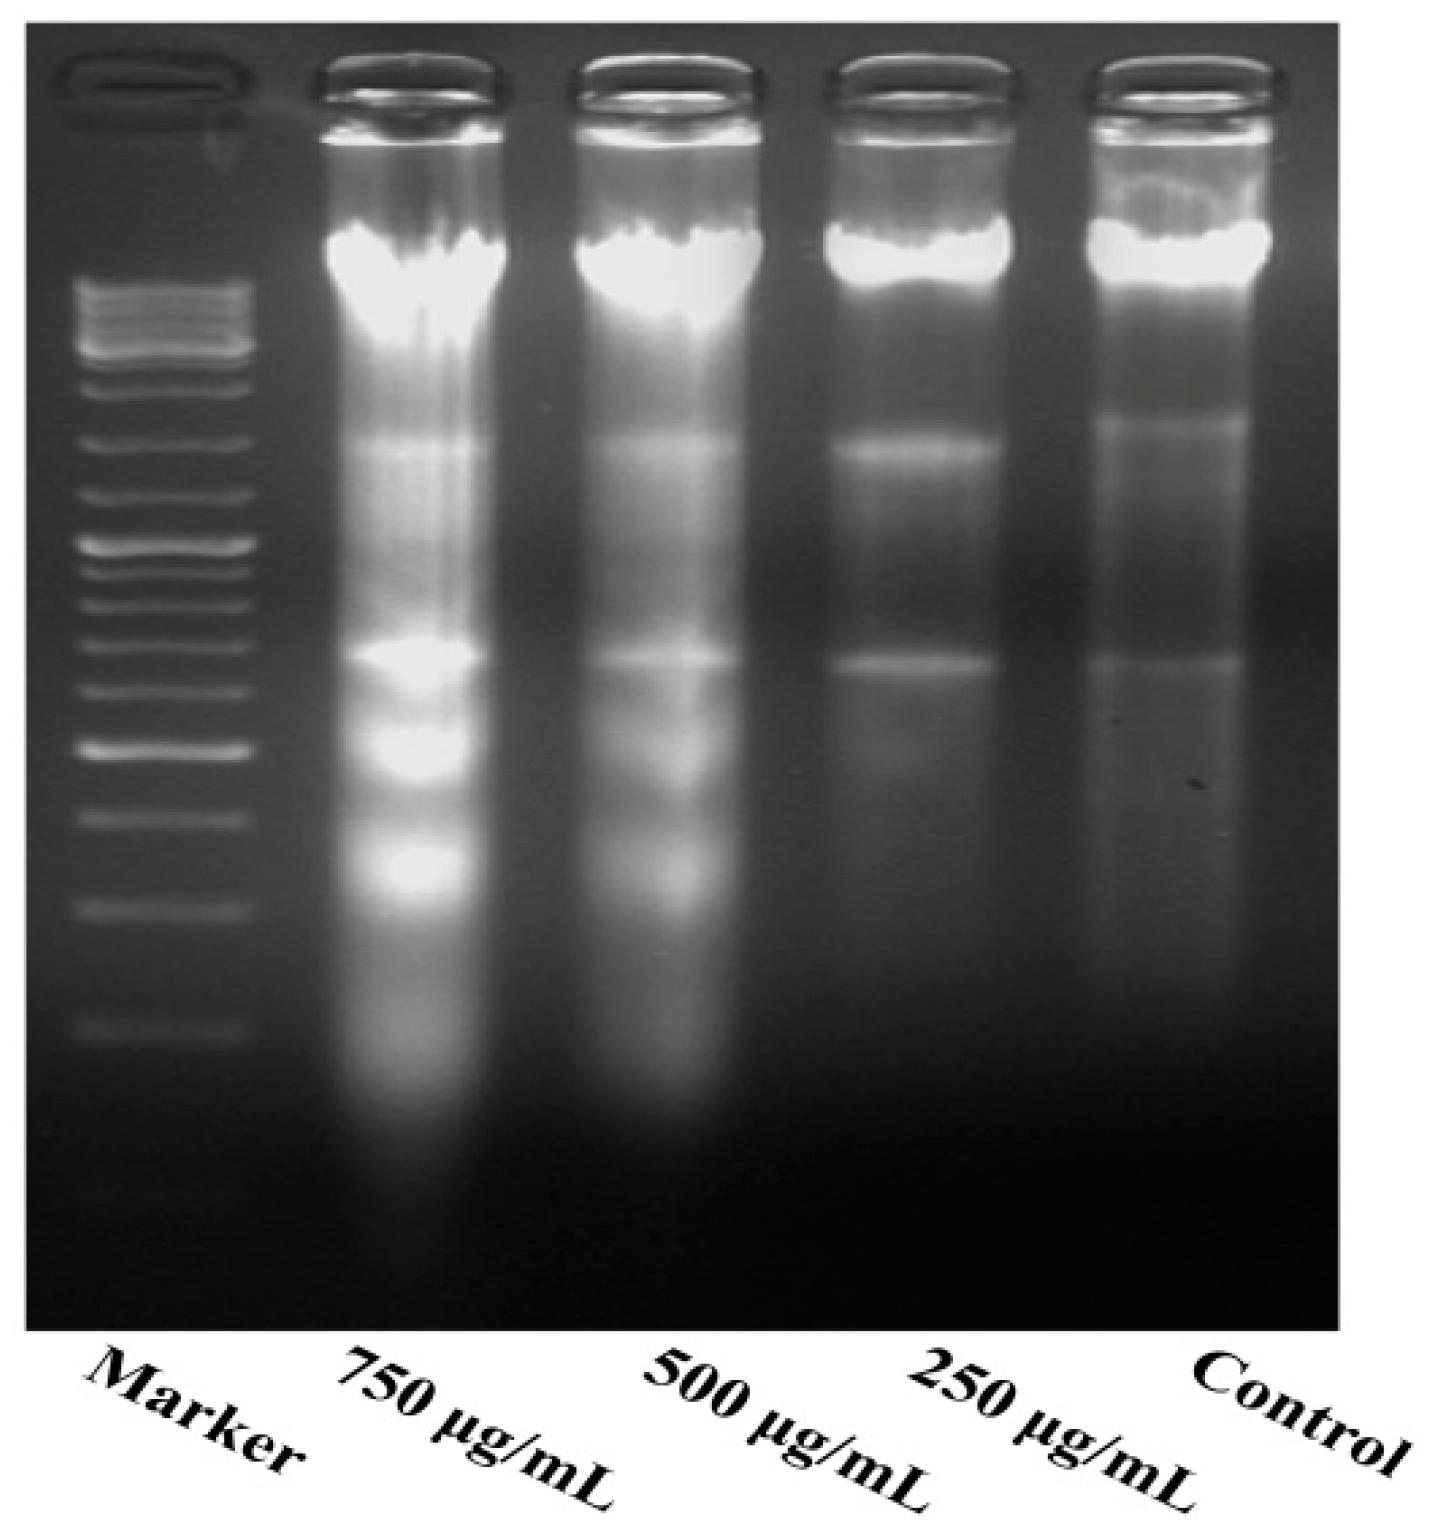 Molecules Free Full Text Methanolic Extract Of Pien Tze Huang Zhang Zhou 21 00283 G005